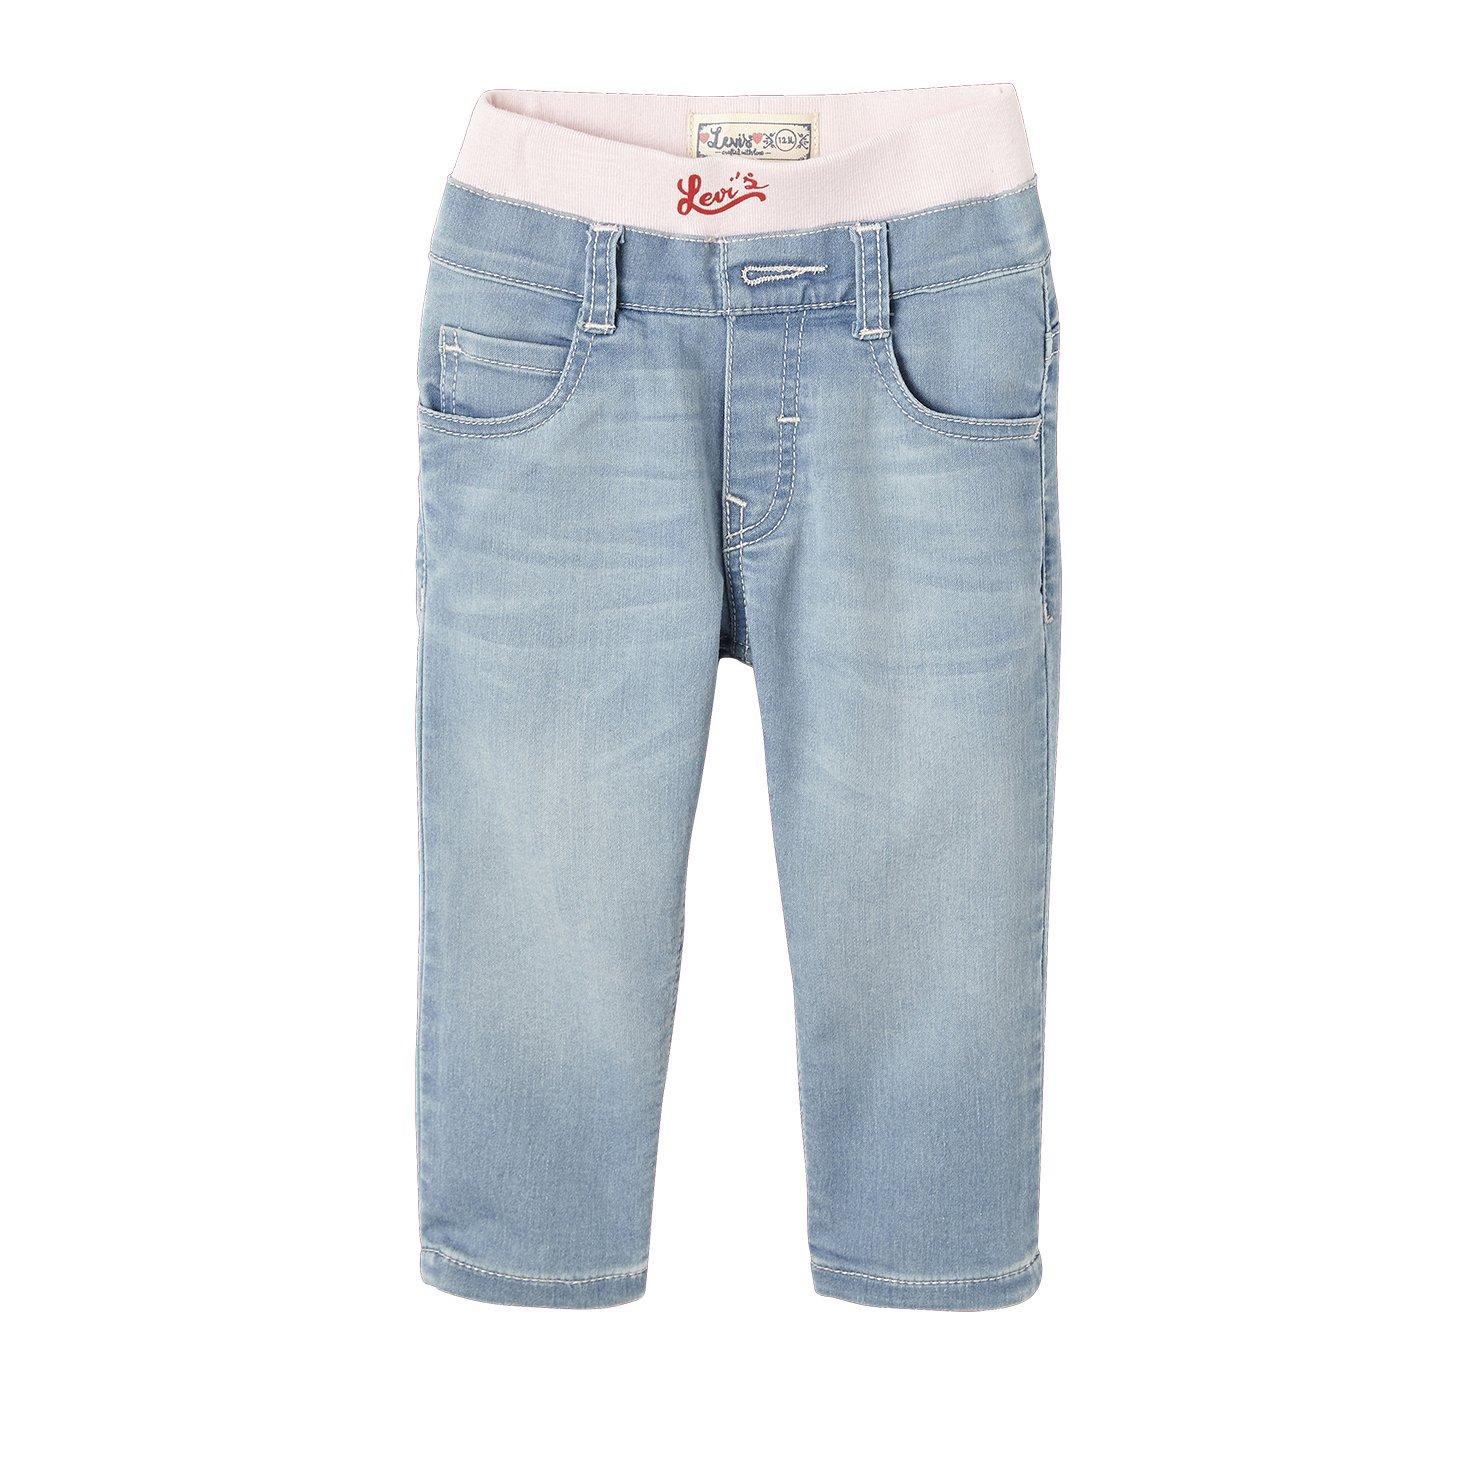 Levi's Baby Girls' Nl22504 Jeans Blue (Denim 46) 12-18 Months Levi's Kids